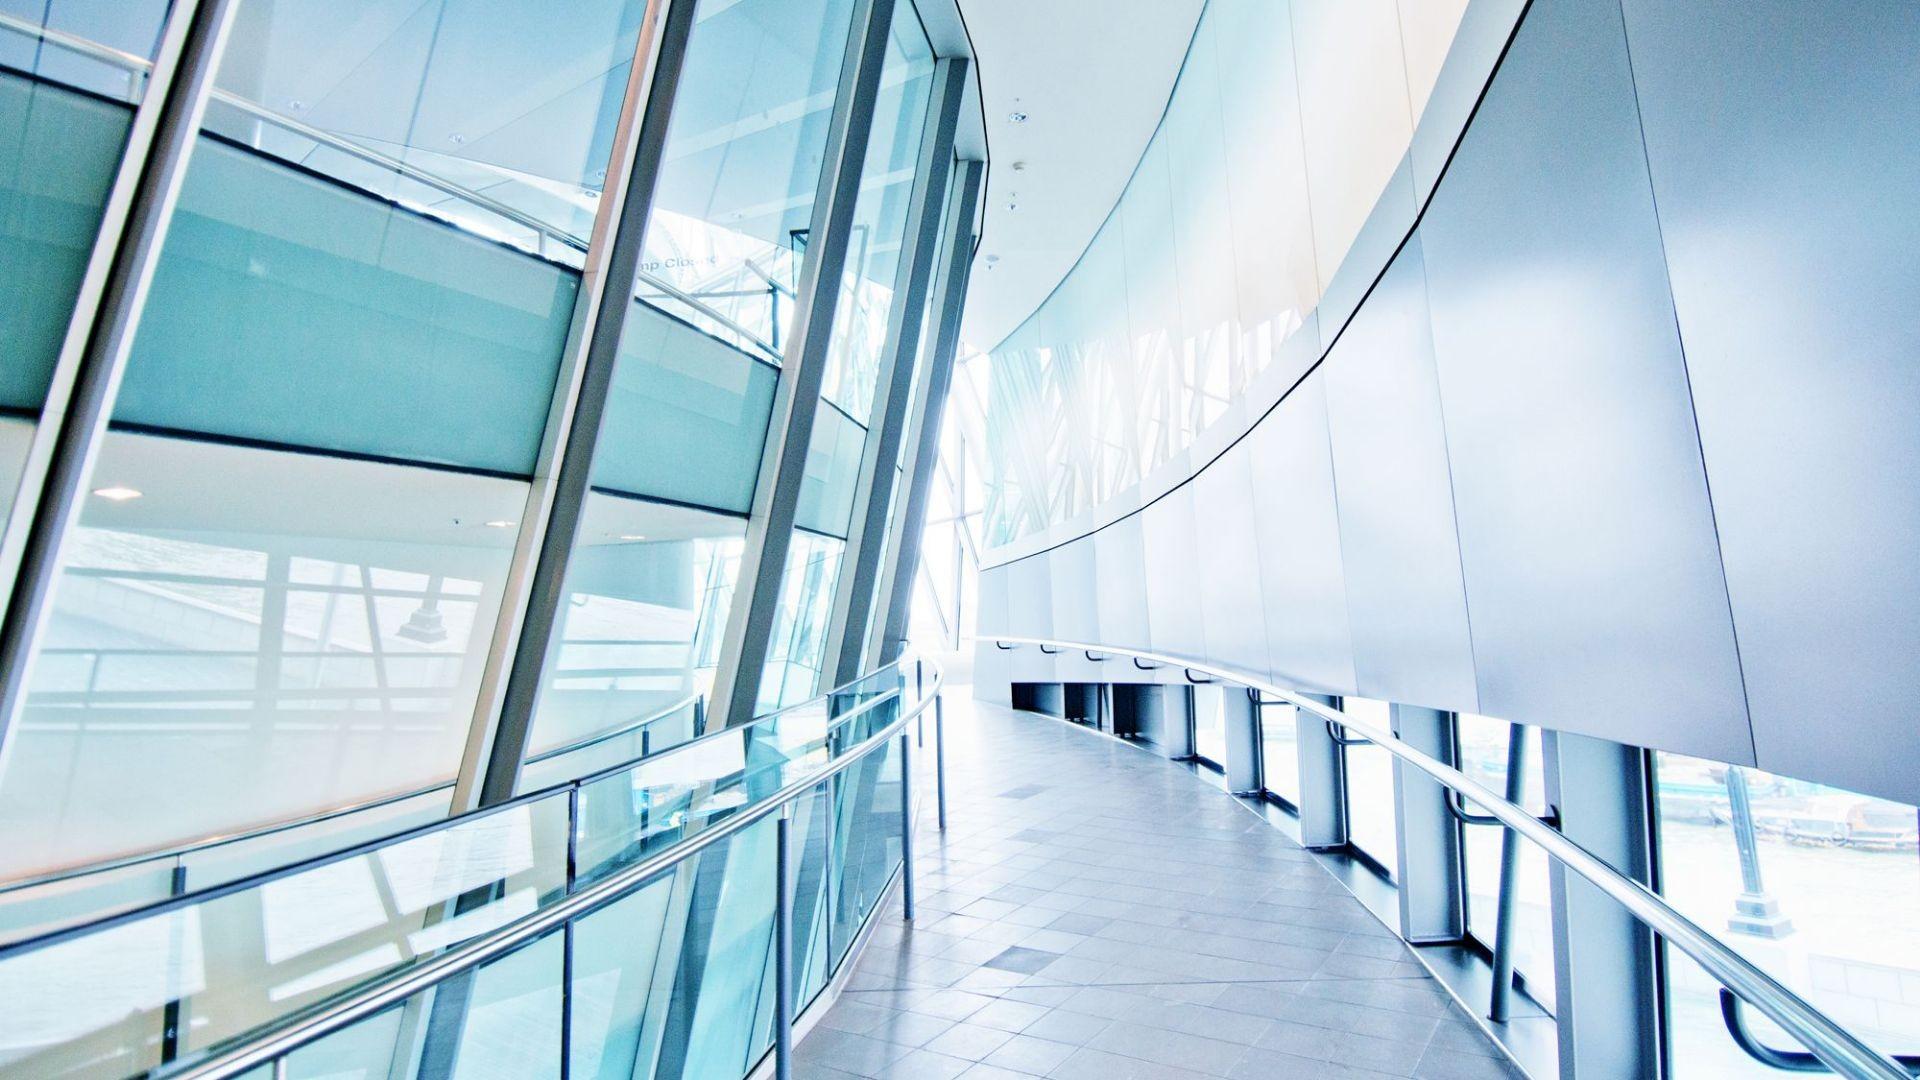 000 cristaleria cristal aluminio barandilla oficina